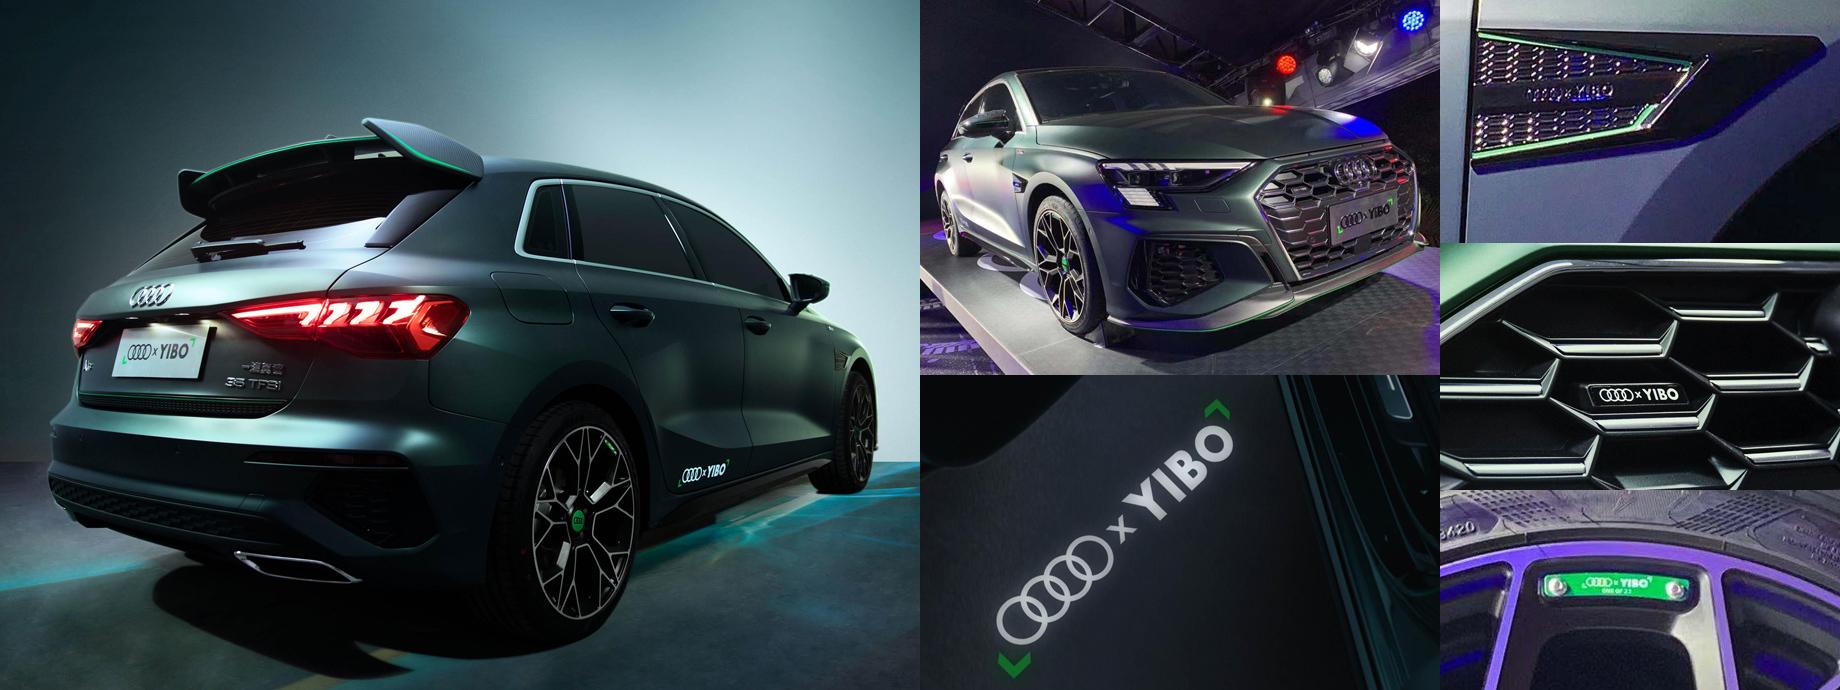 Хетчбек Audi A3 Wang Yibo зробив ставку на дизайн